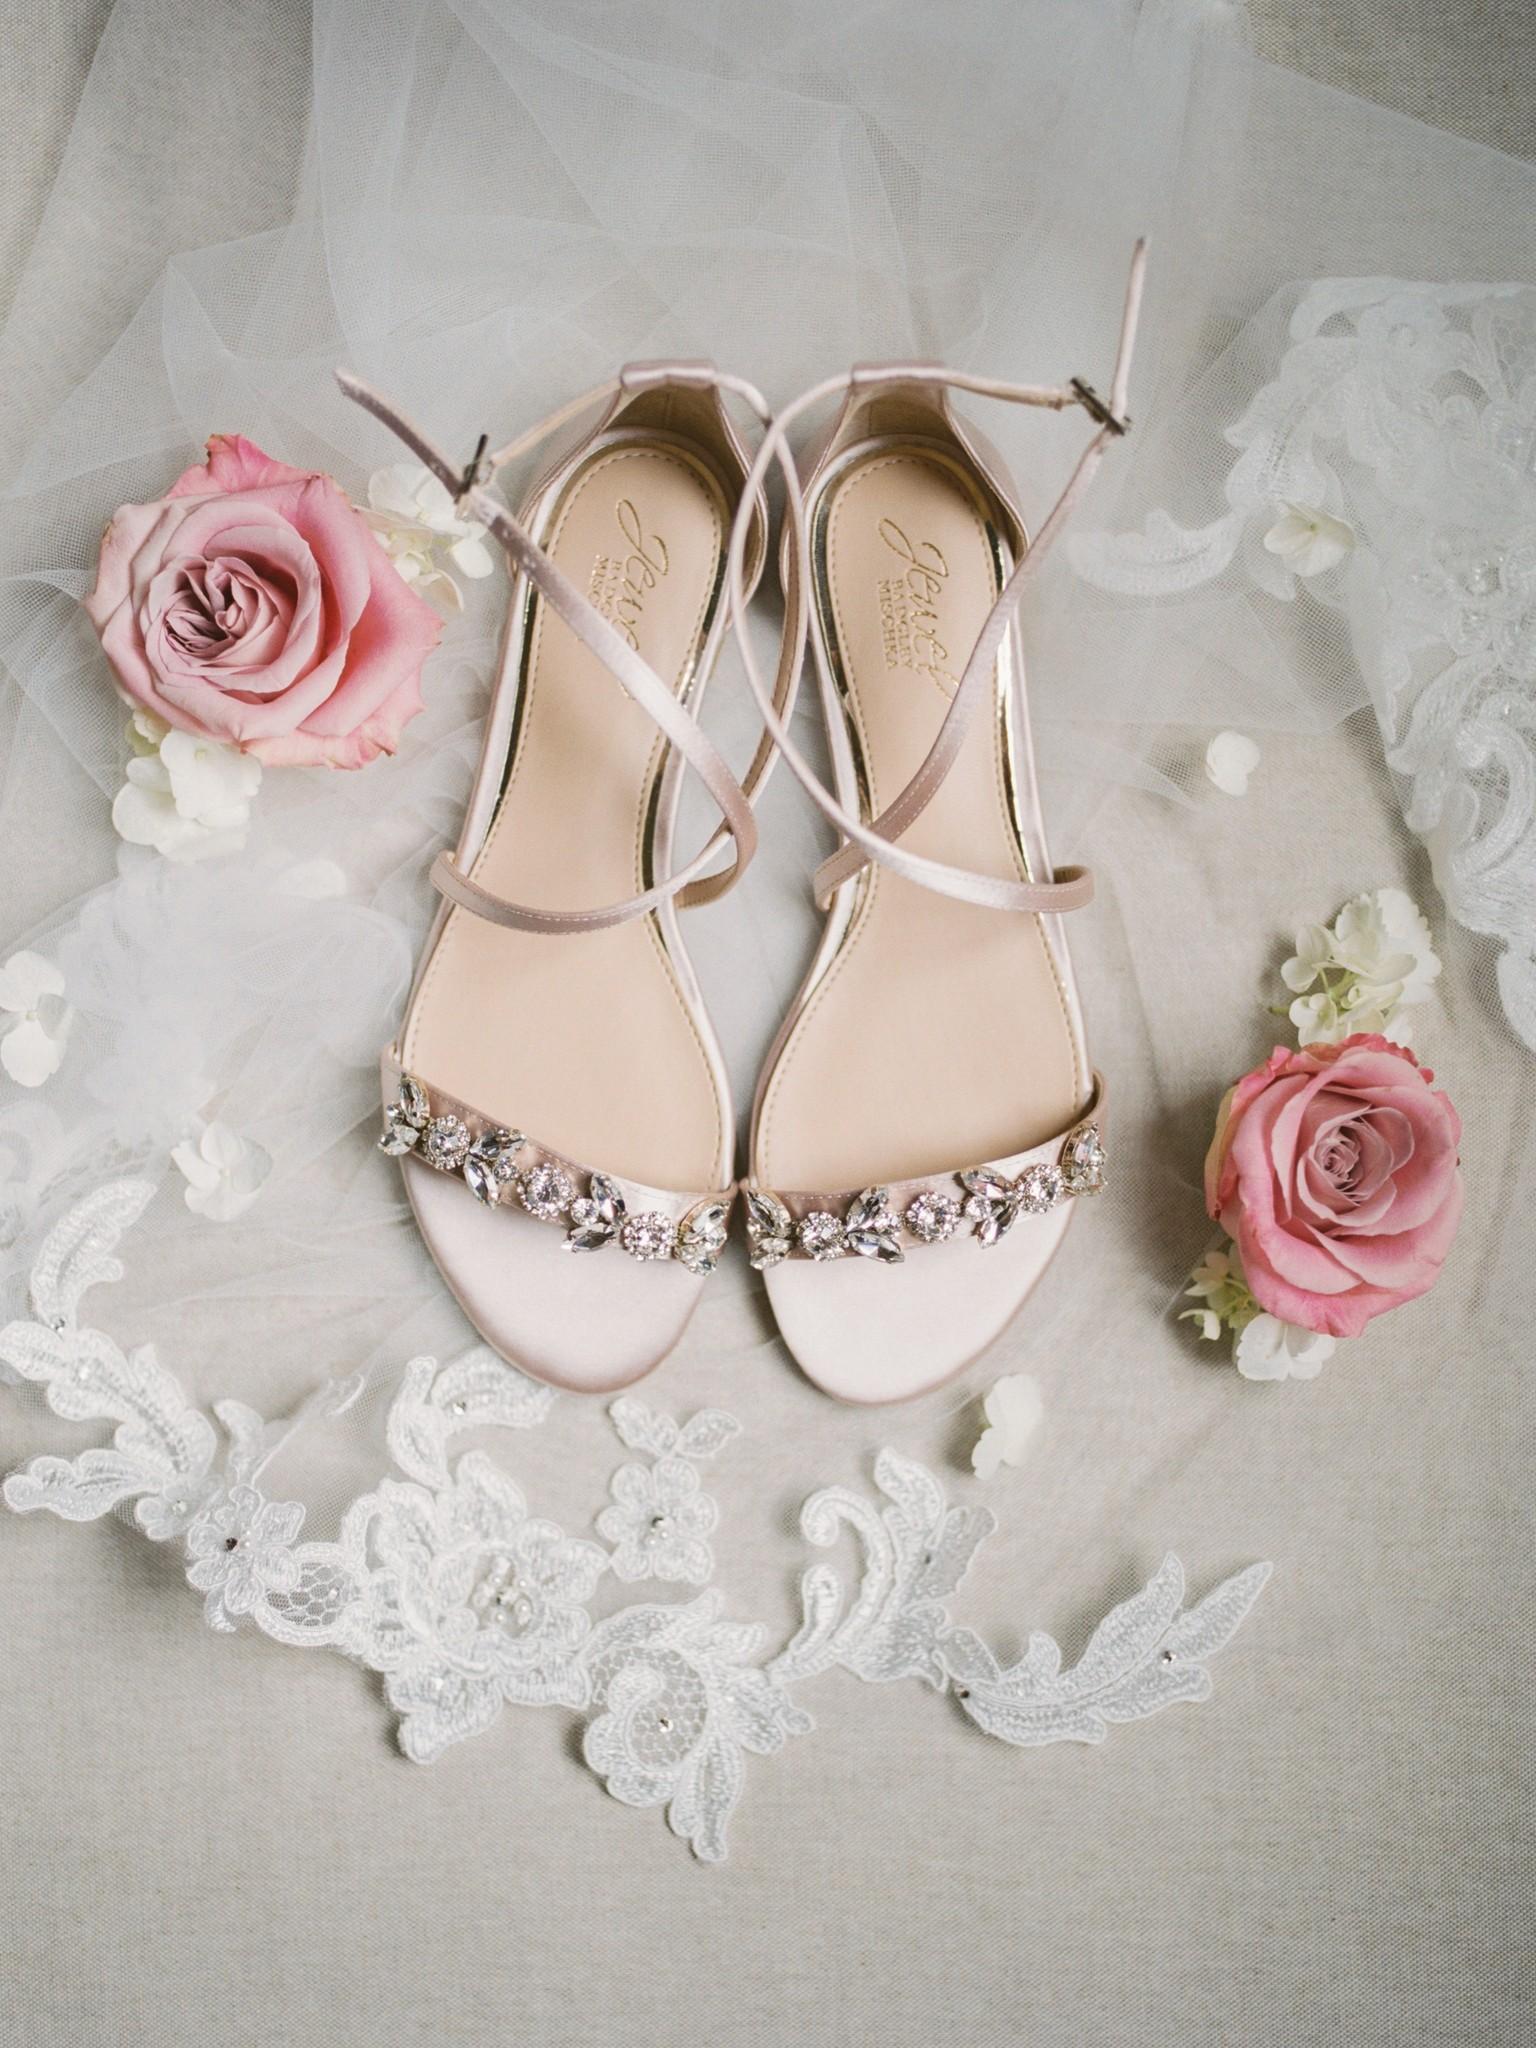 VA-Great-Marsh-Estate-Summer-Wedding-Blush-5.jpg